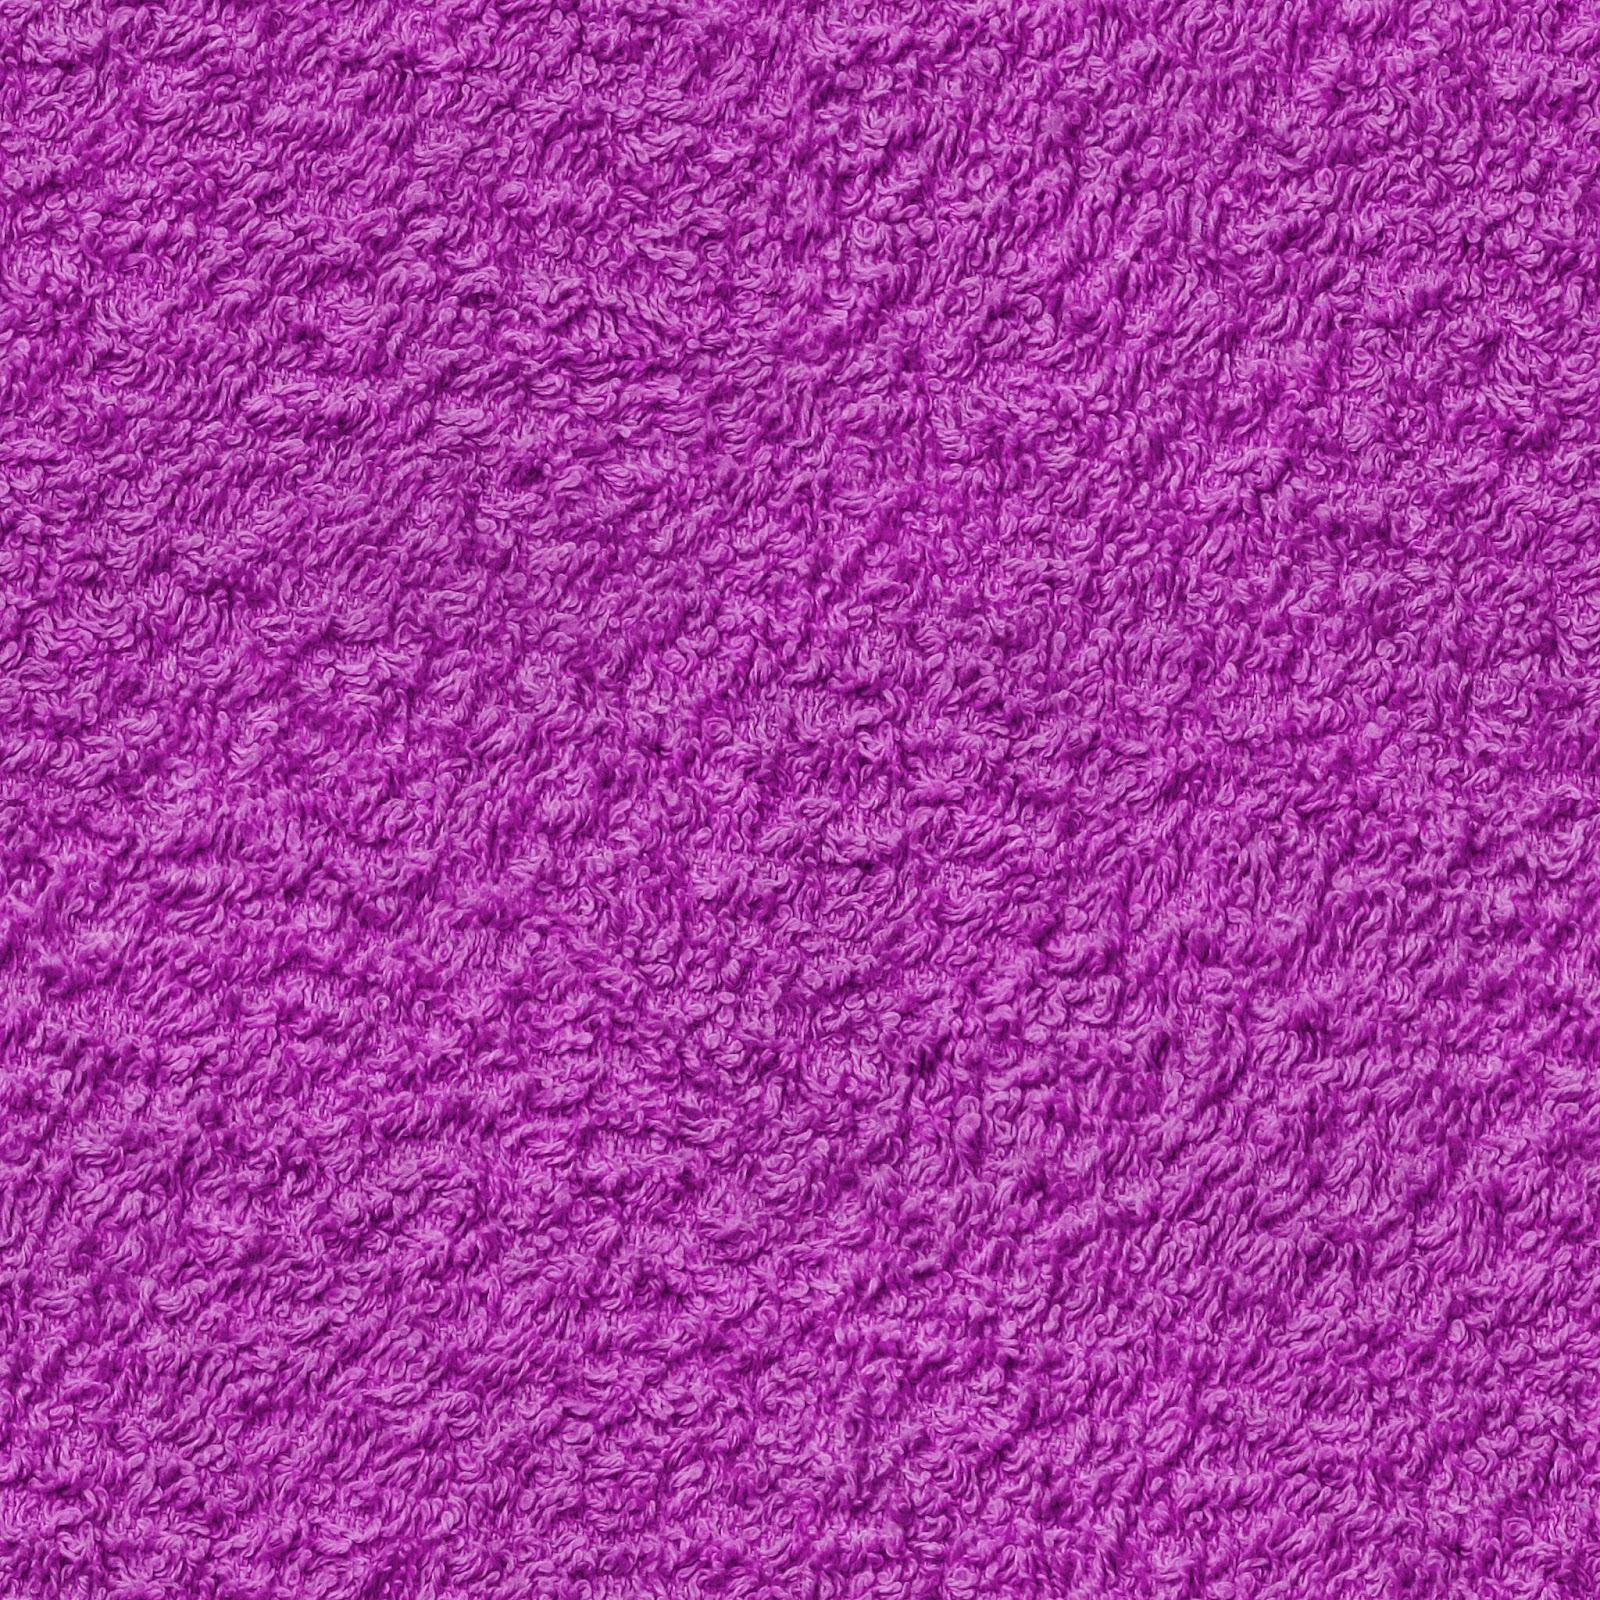 High Resolution Textures Seamless Fabric Towel Carpet Cushion